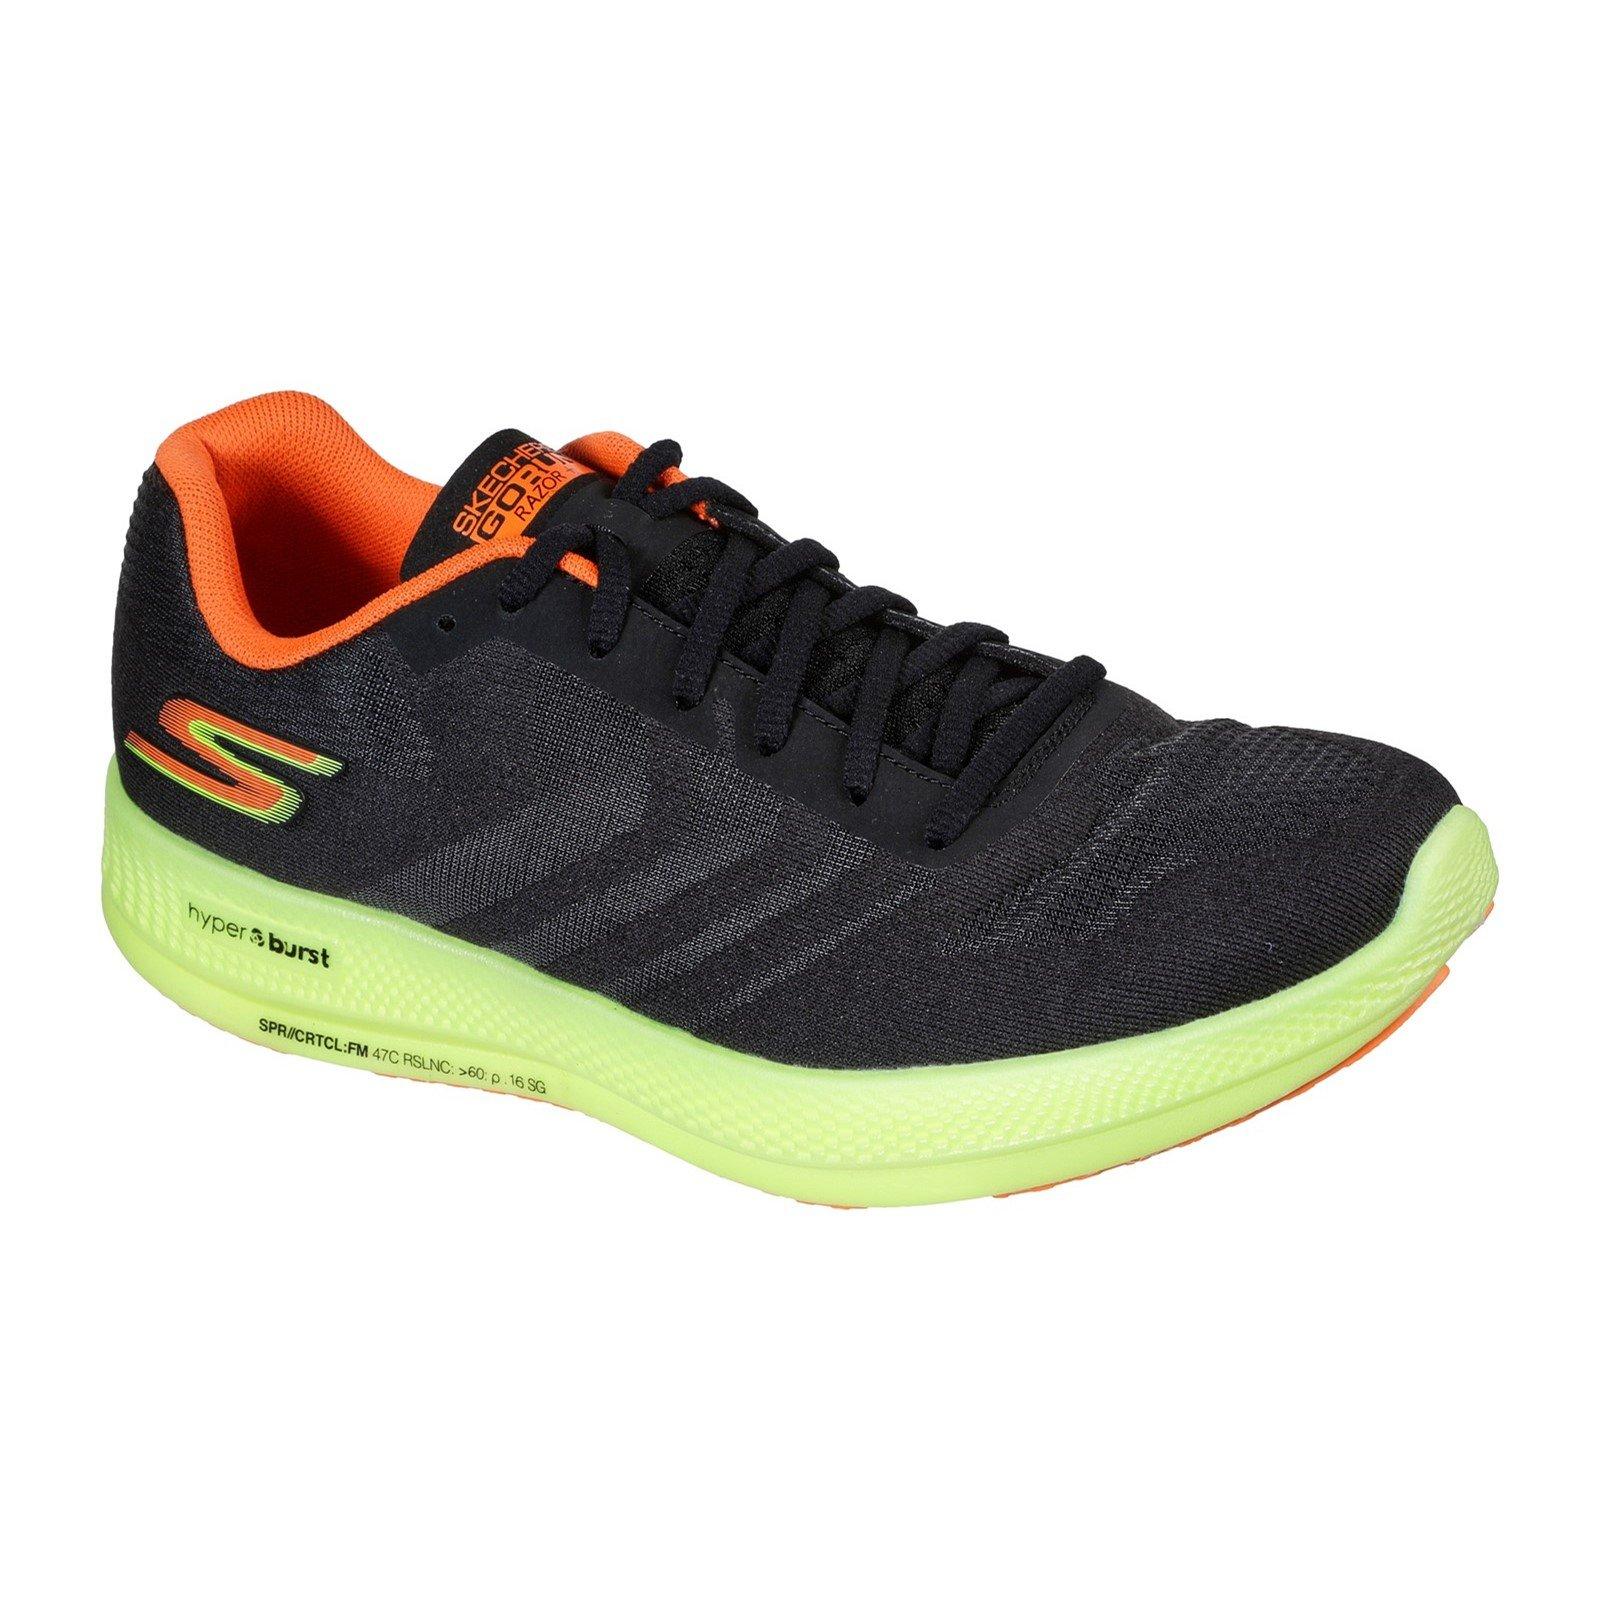 Skechers Women's Go Run Razor Trainer Various Colours 32703 - Black/Yellow/Orange 7